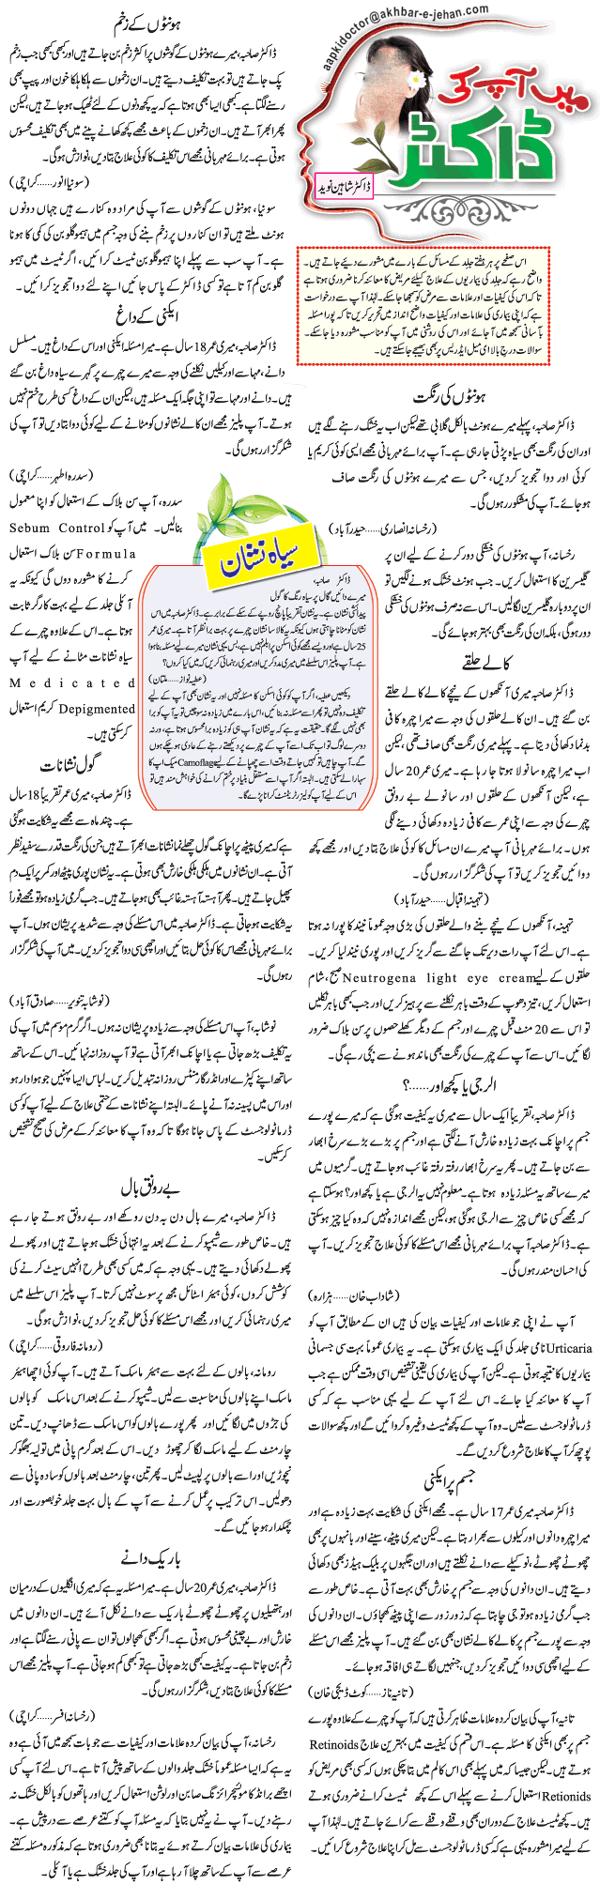 Aap ki Doctor Weekly Akhbar e Jehan Urdu Tips Totkay Acne Pimples Dark Cricle Hair Face Skin Pikn Lips by Dr Shaheen Naveed November 2014